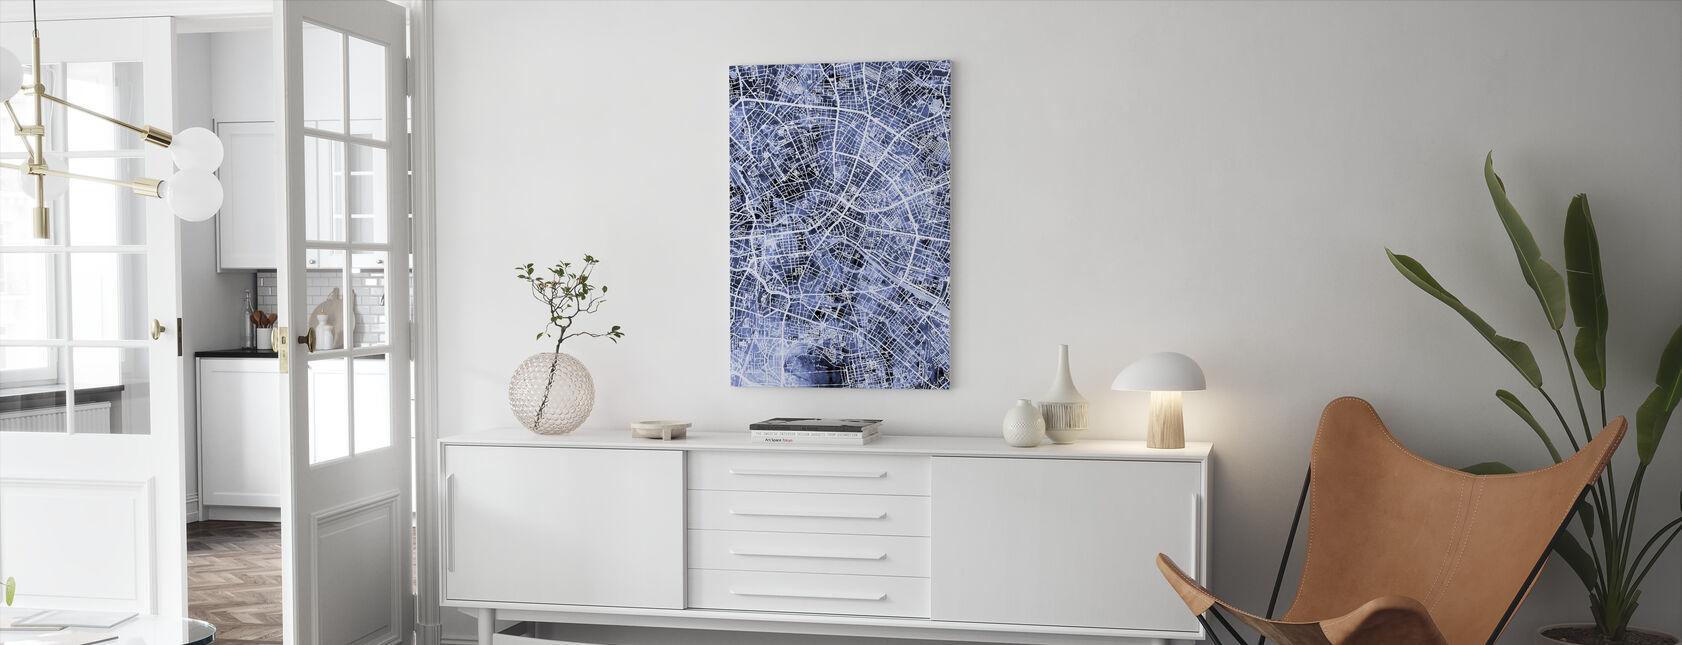 Berlin Germany City Map - Canvas print - Living Room